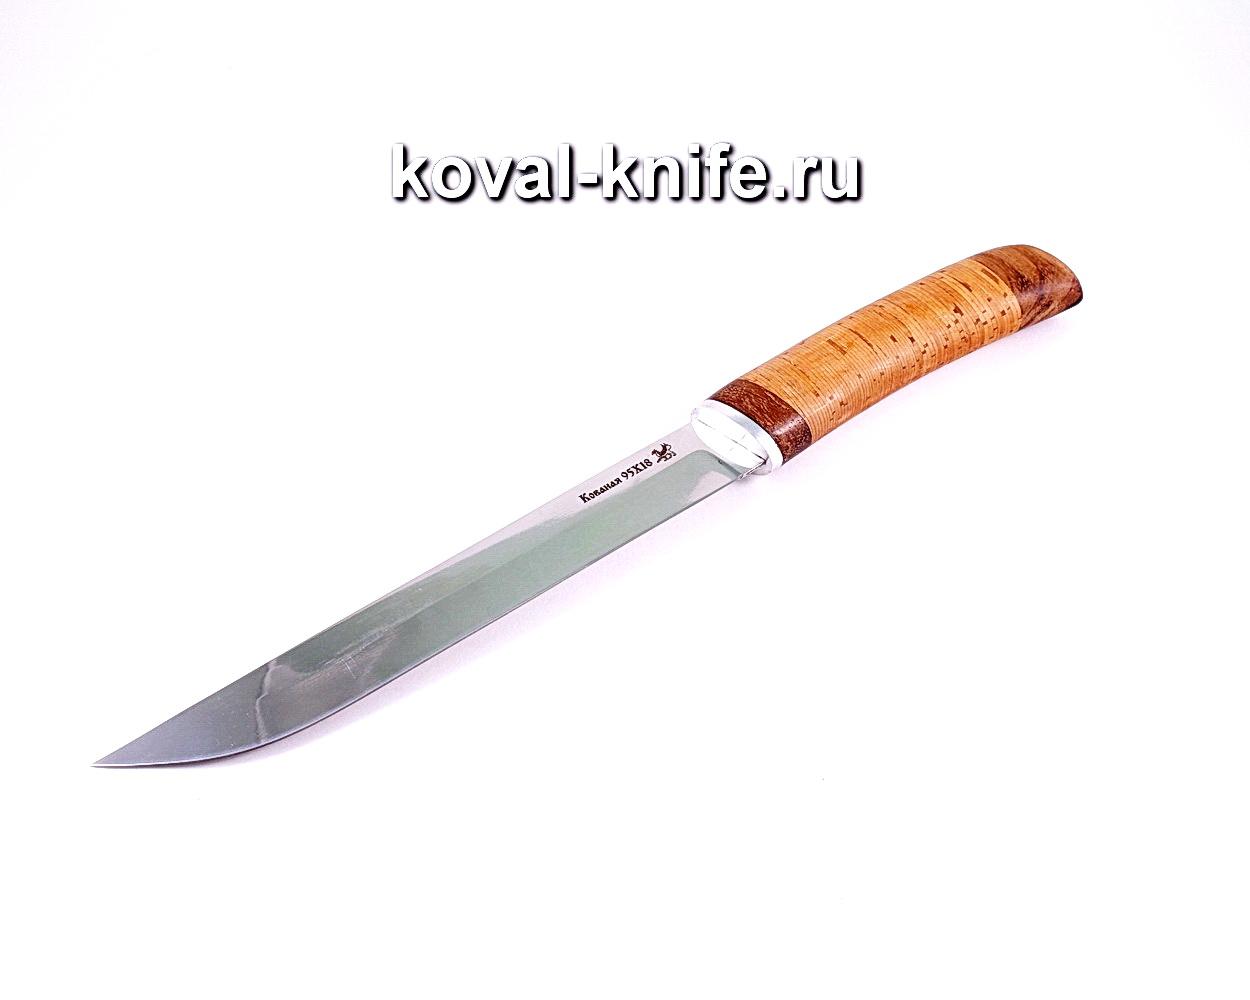 Нож Кухонный (Сталь 95х18), рукоять орех,береста A004